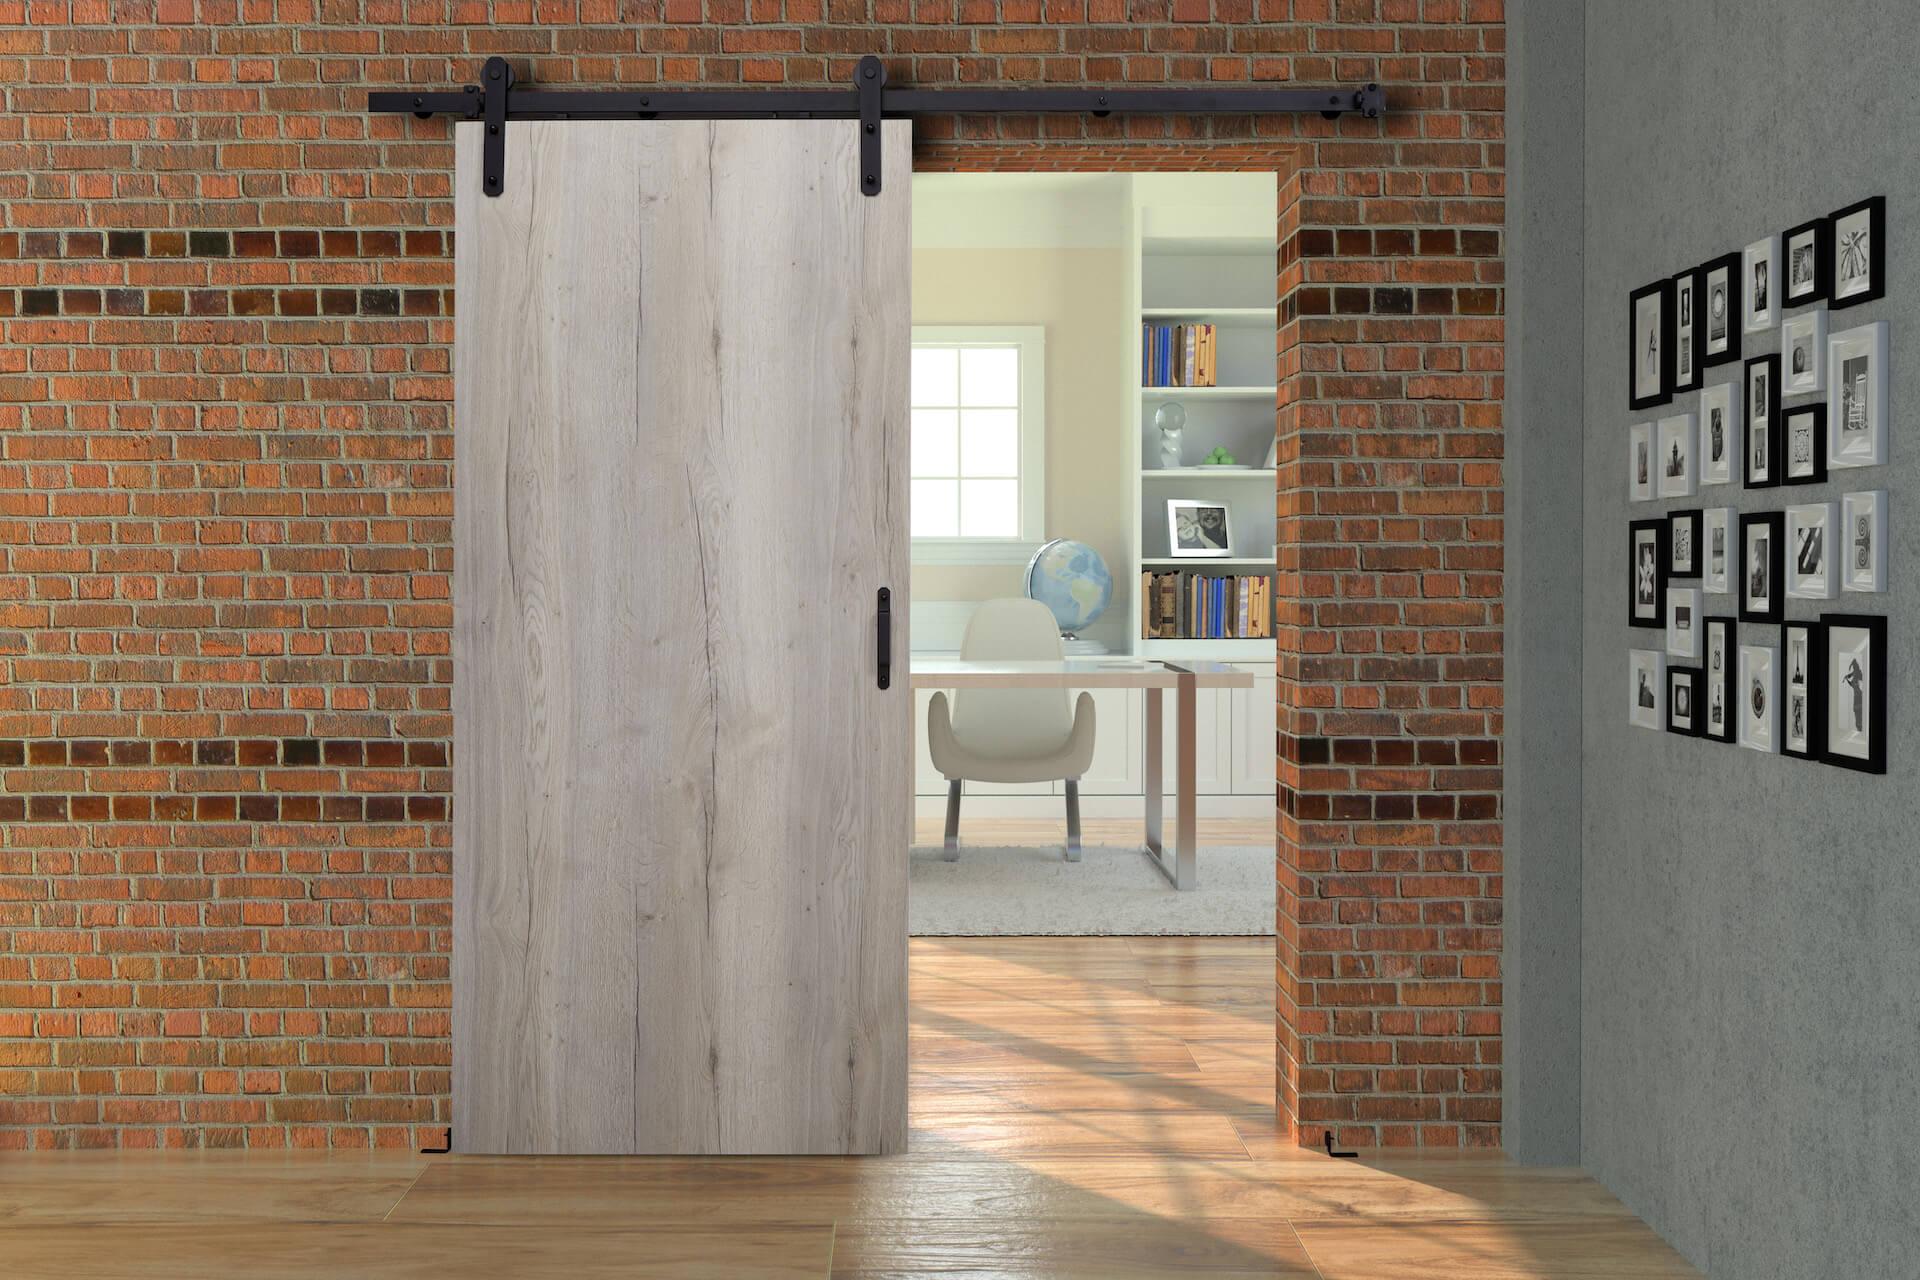 HS-Loft | Rahmenloser Holzschiebetür-Beschlag im Loft-Design